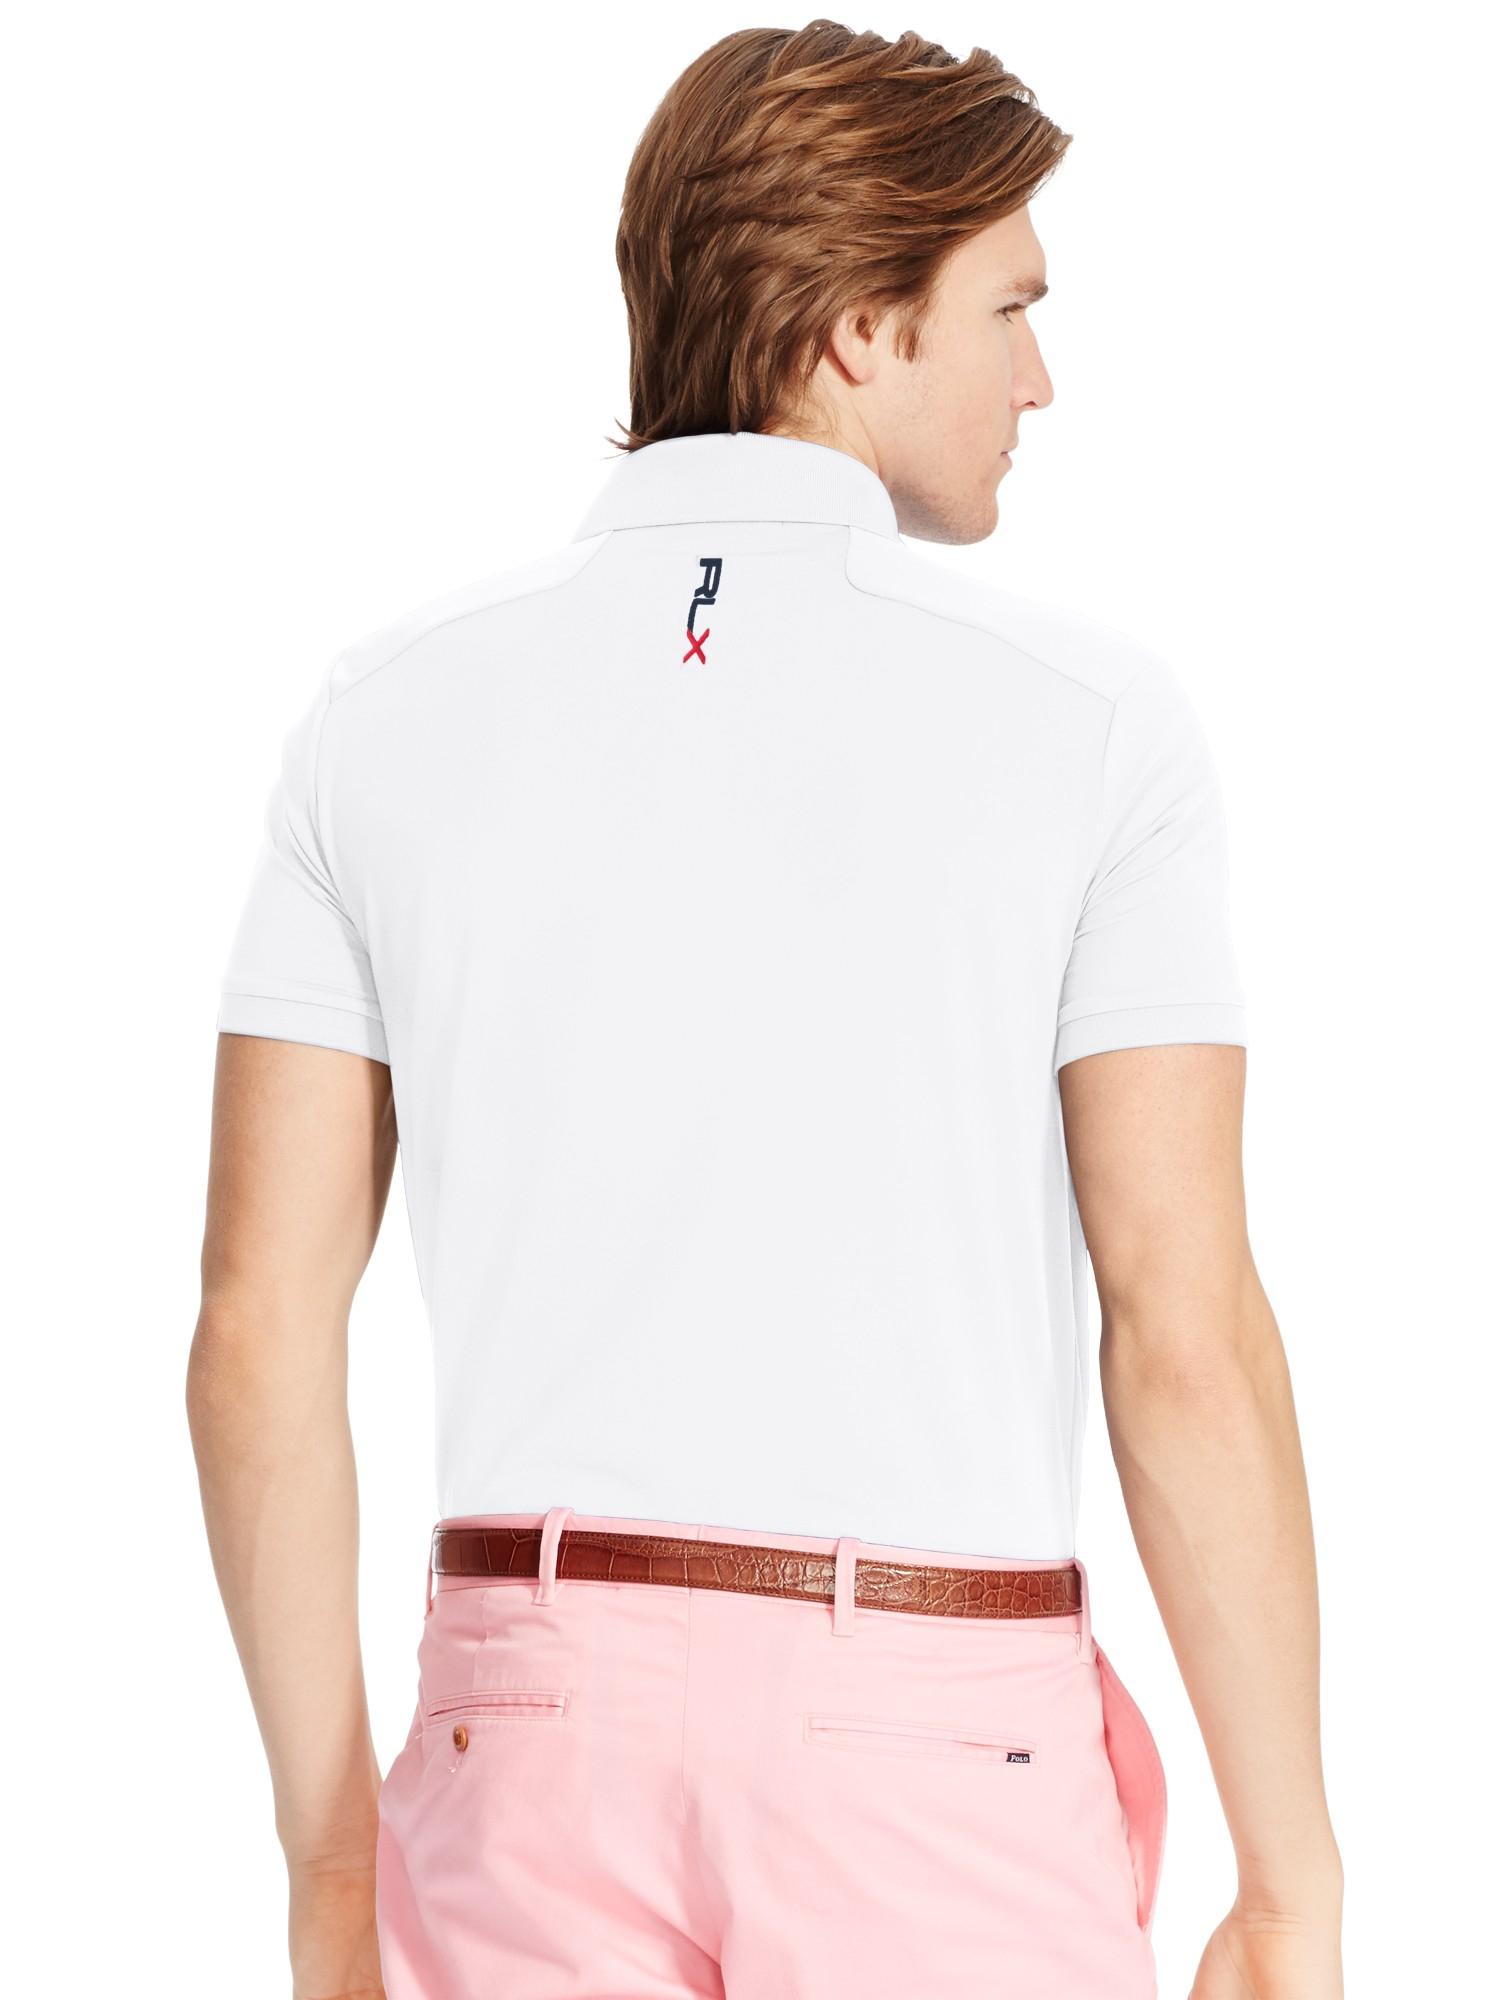 Ralph Lauren Rlx Golf Classic Fit Rlx Polo Shirt   Where to buy \\u0026amp;